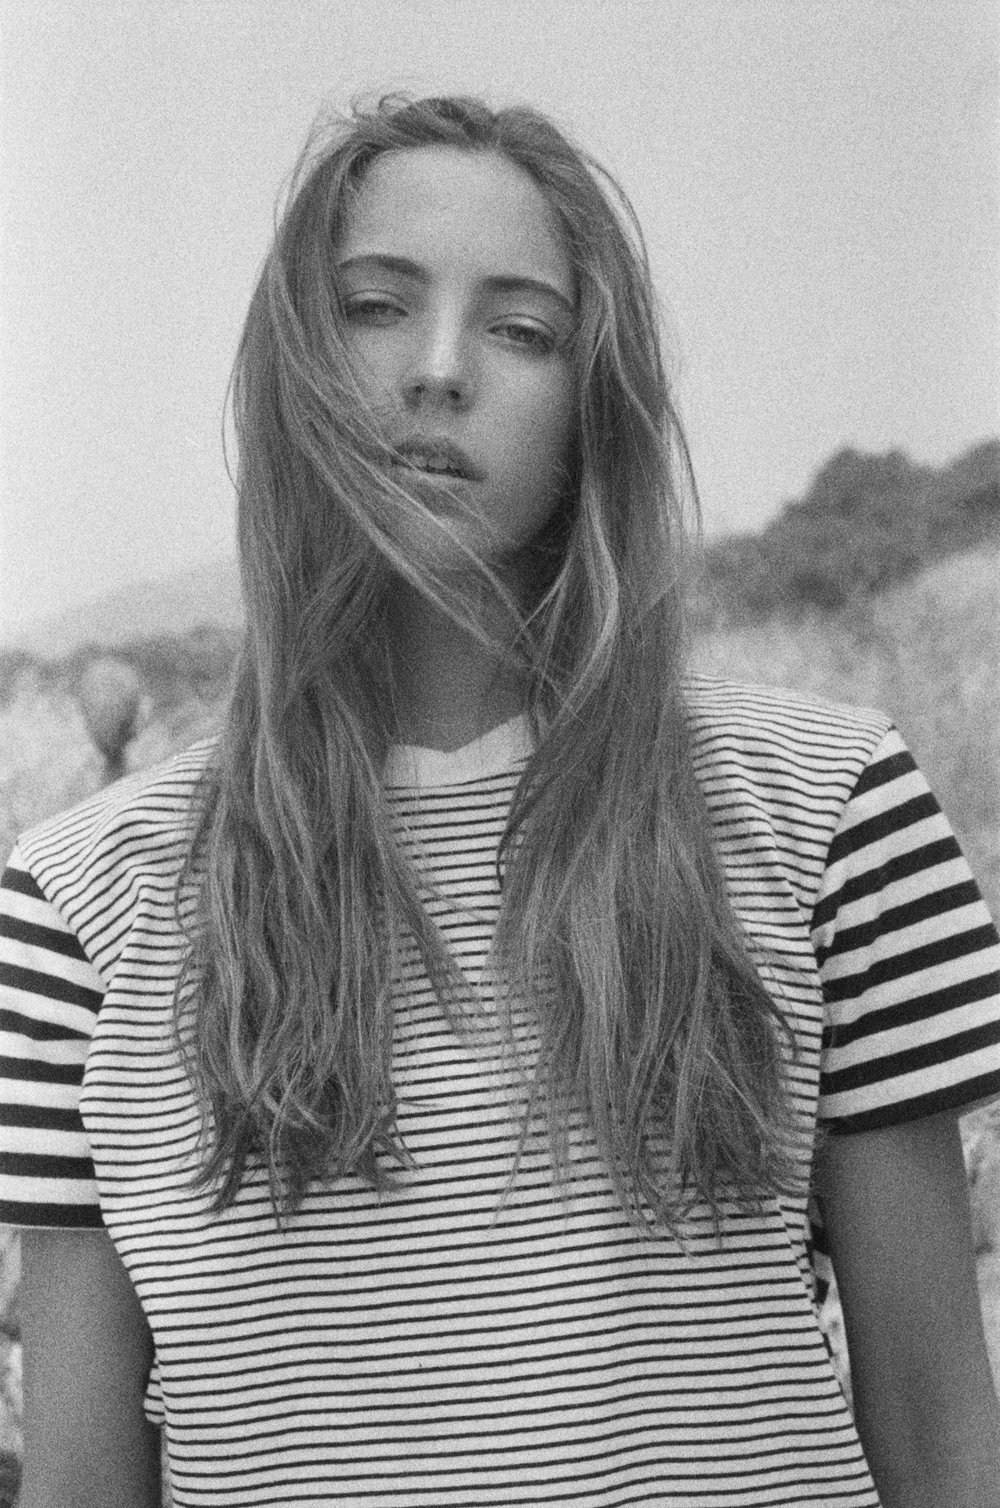 Aliya-Ware-by-Jacqueline-Puwalski-31.jpg